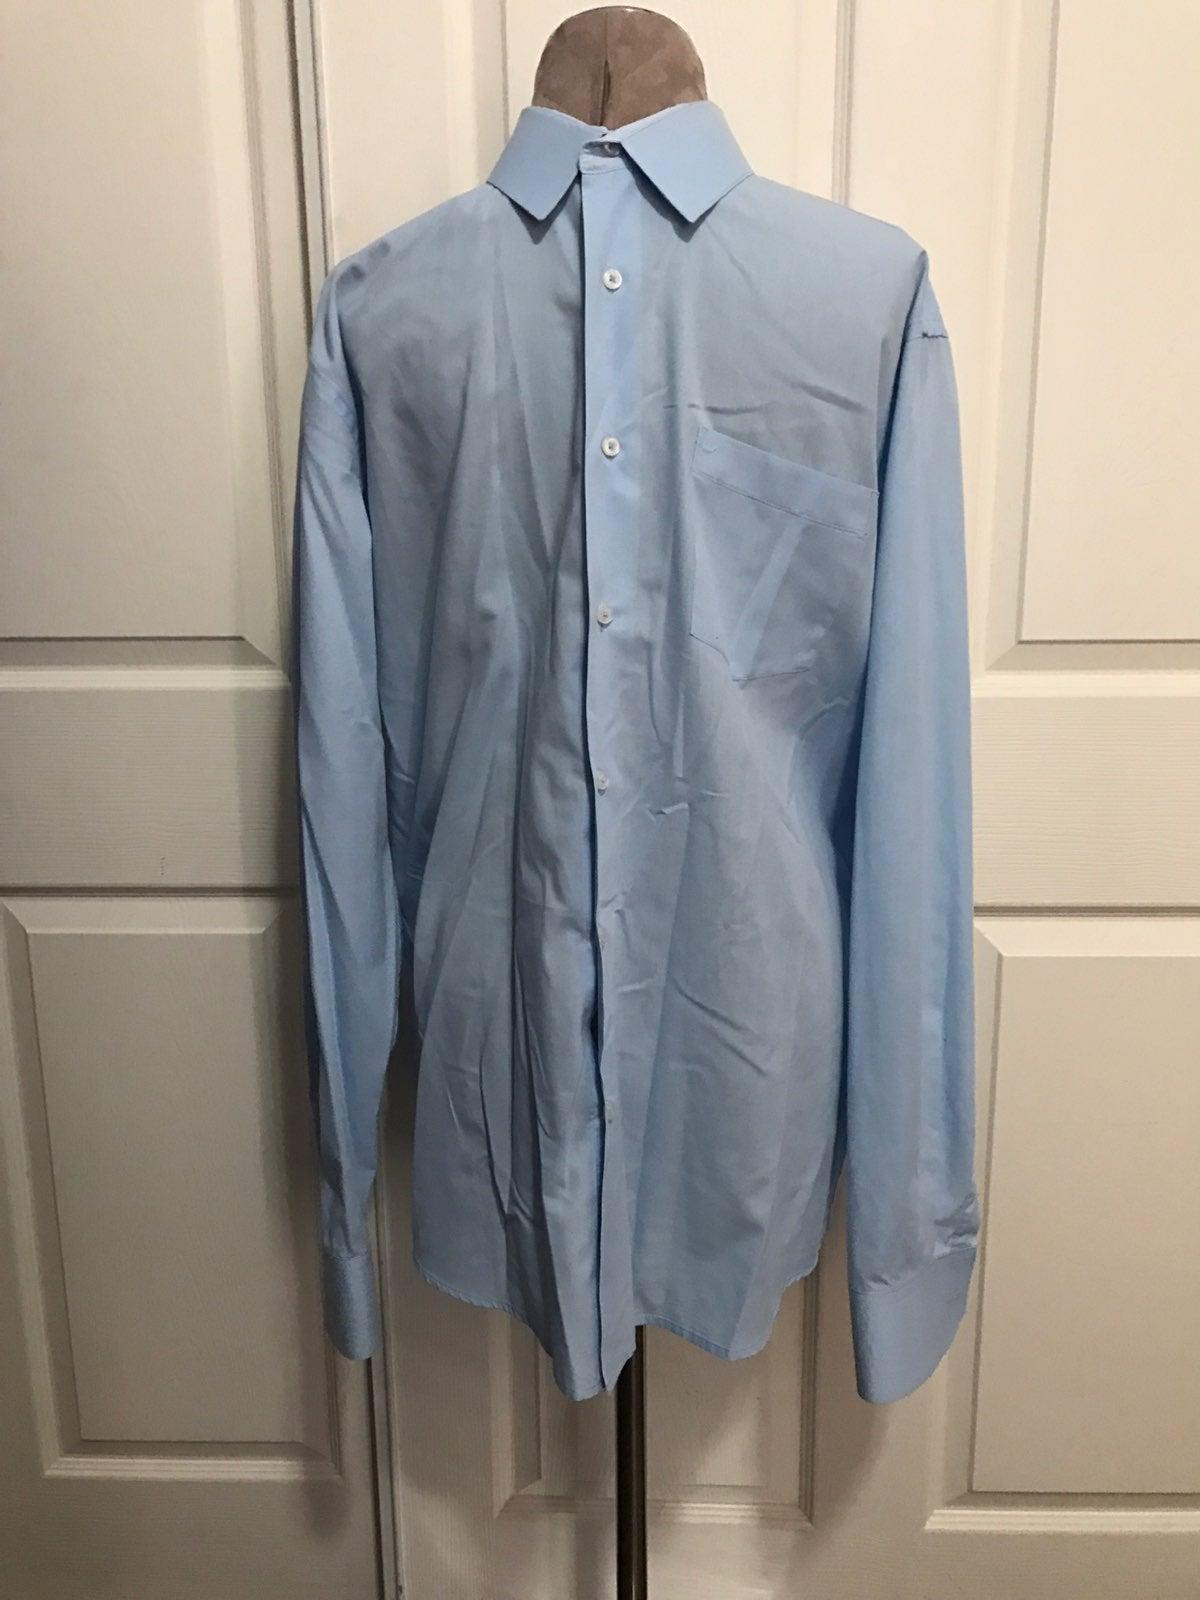 Berlioni Italy Dress Shirt